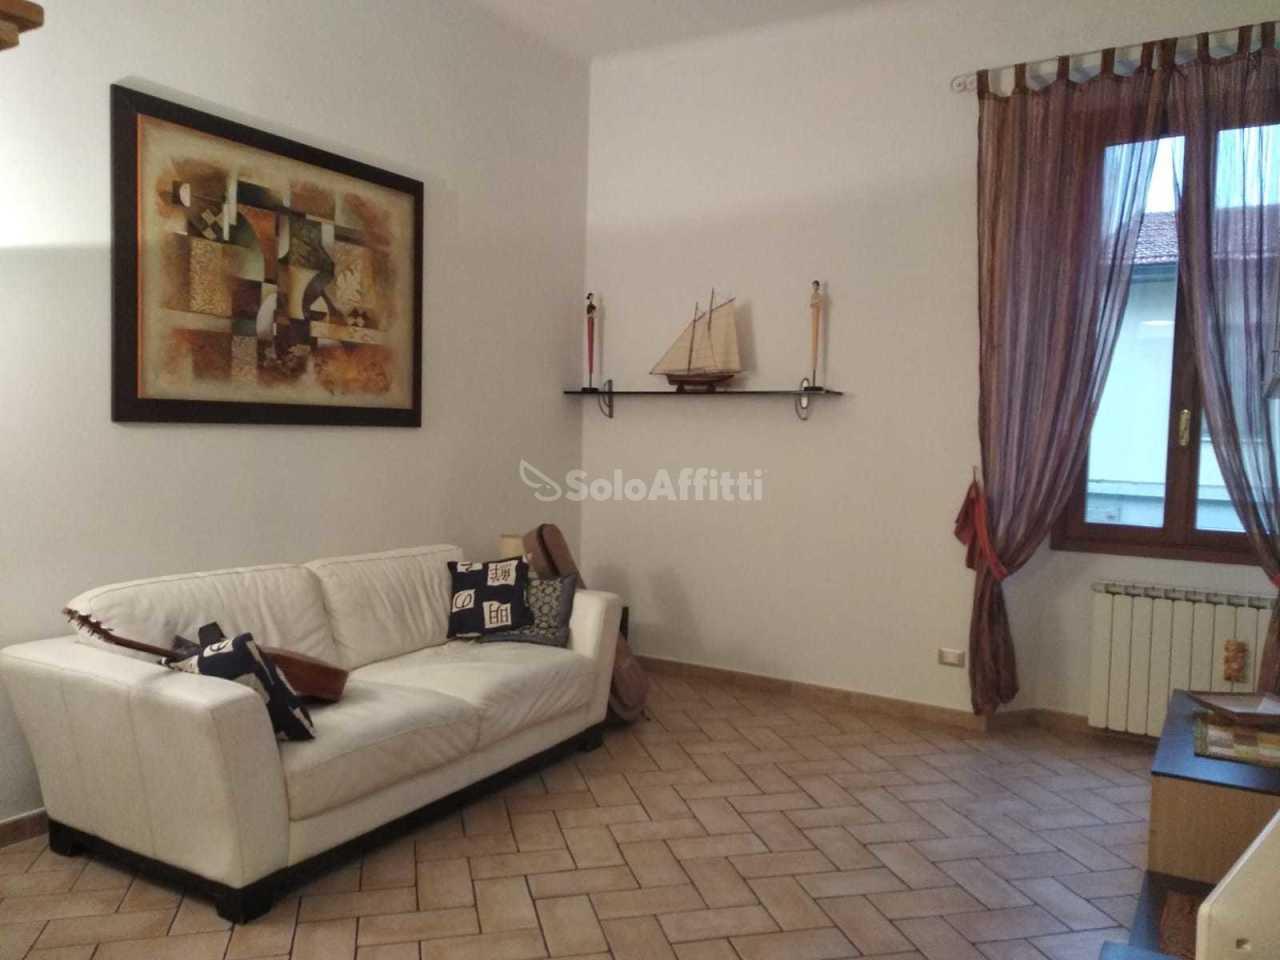 Appartamento - Quadrilocale a Piazza Puccini, Firenze